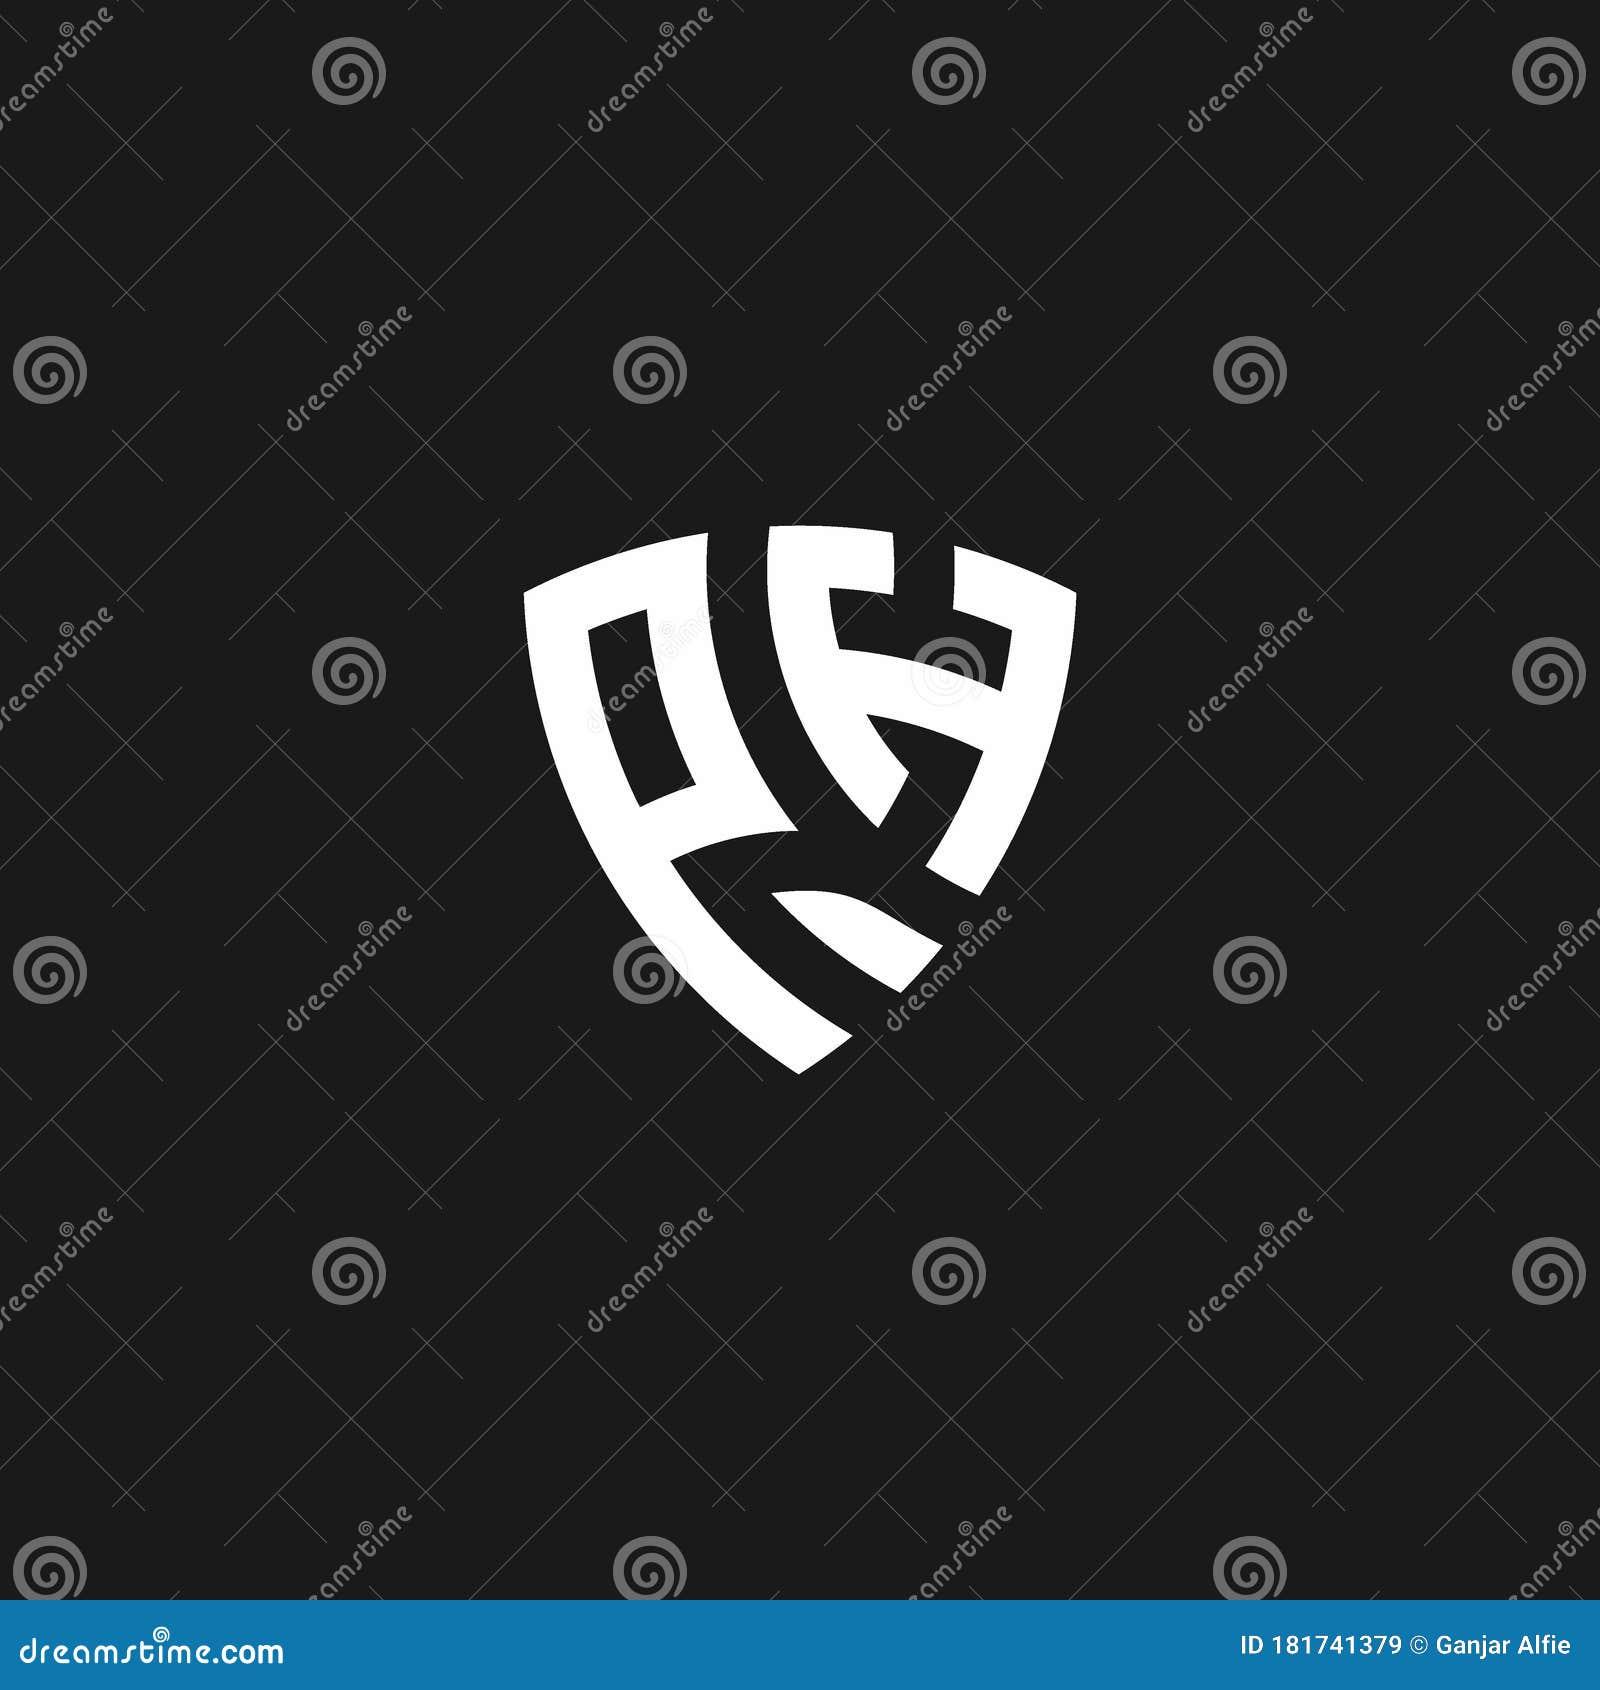 Ph Monogram Logo With Shield Shape Stock Vector Illustration Of Marketing Initials 181741379